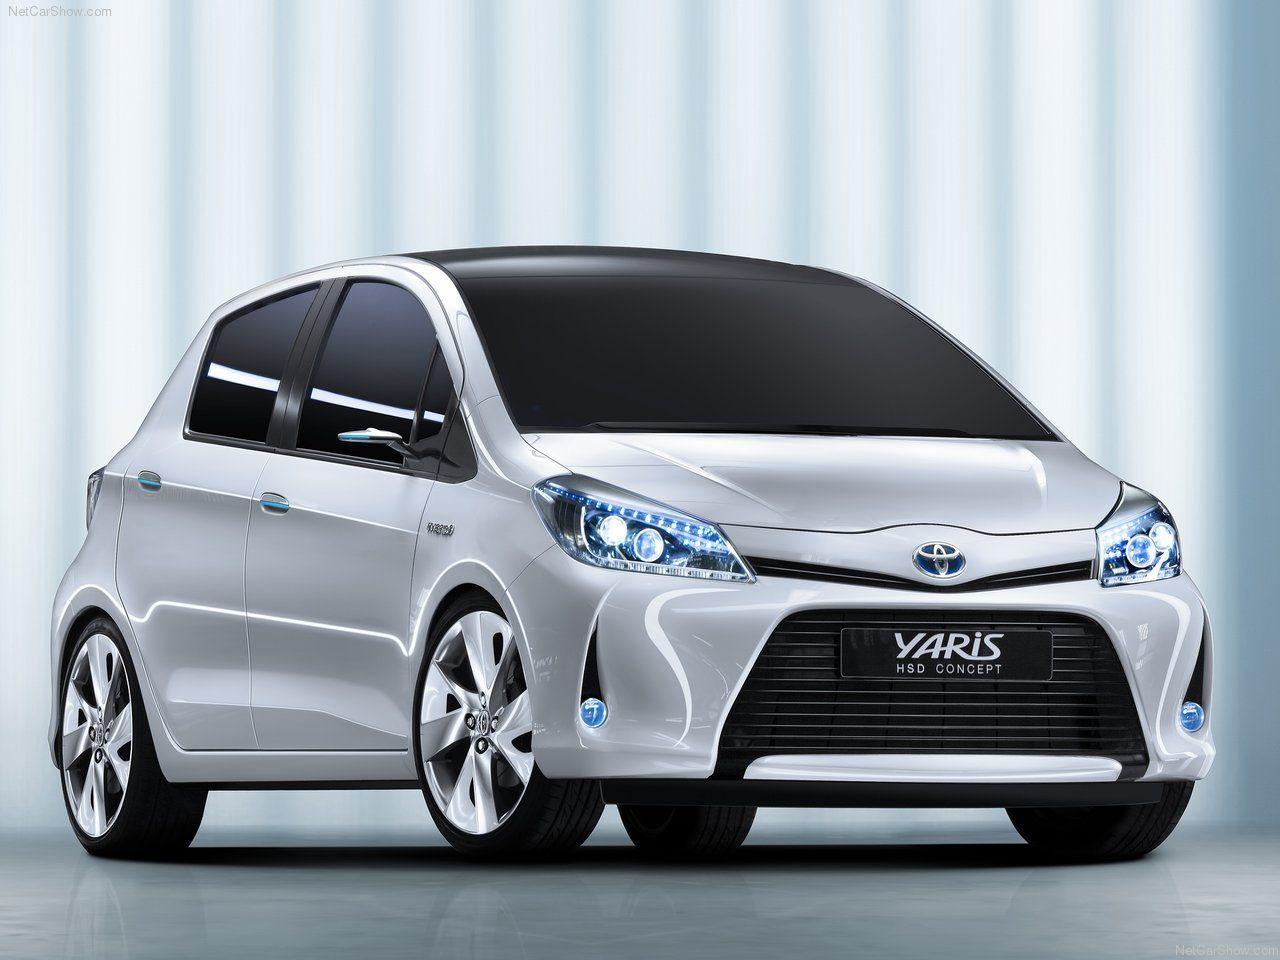 Explore Kia Venga 2020, performance and technology